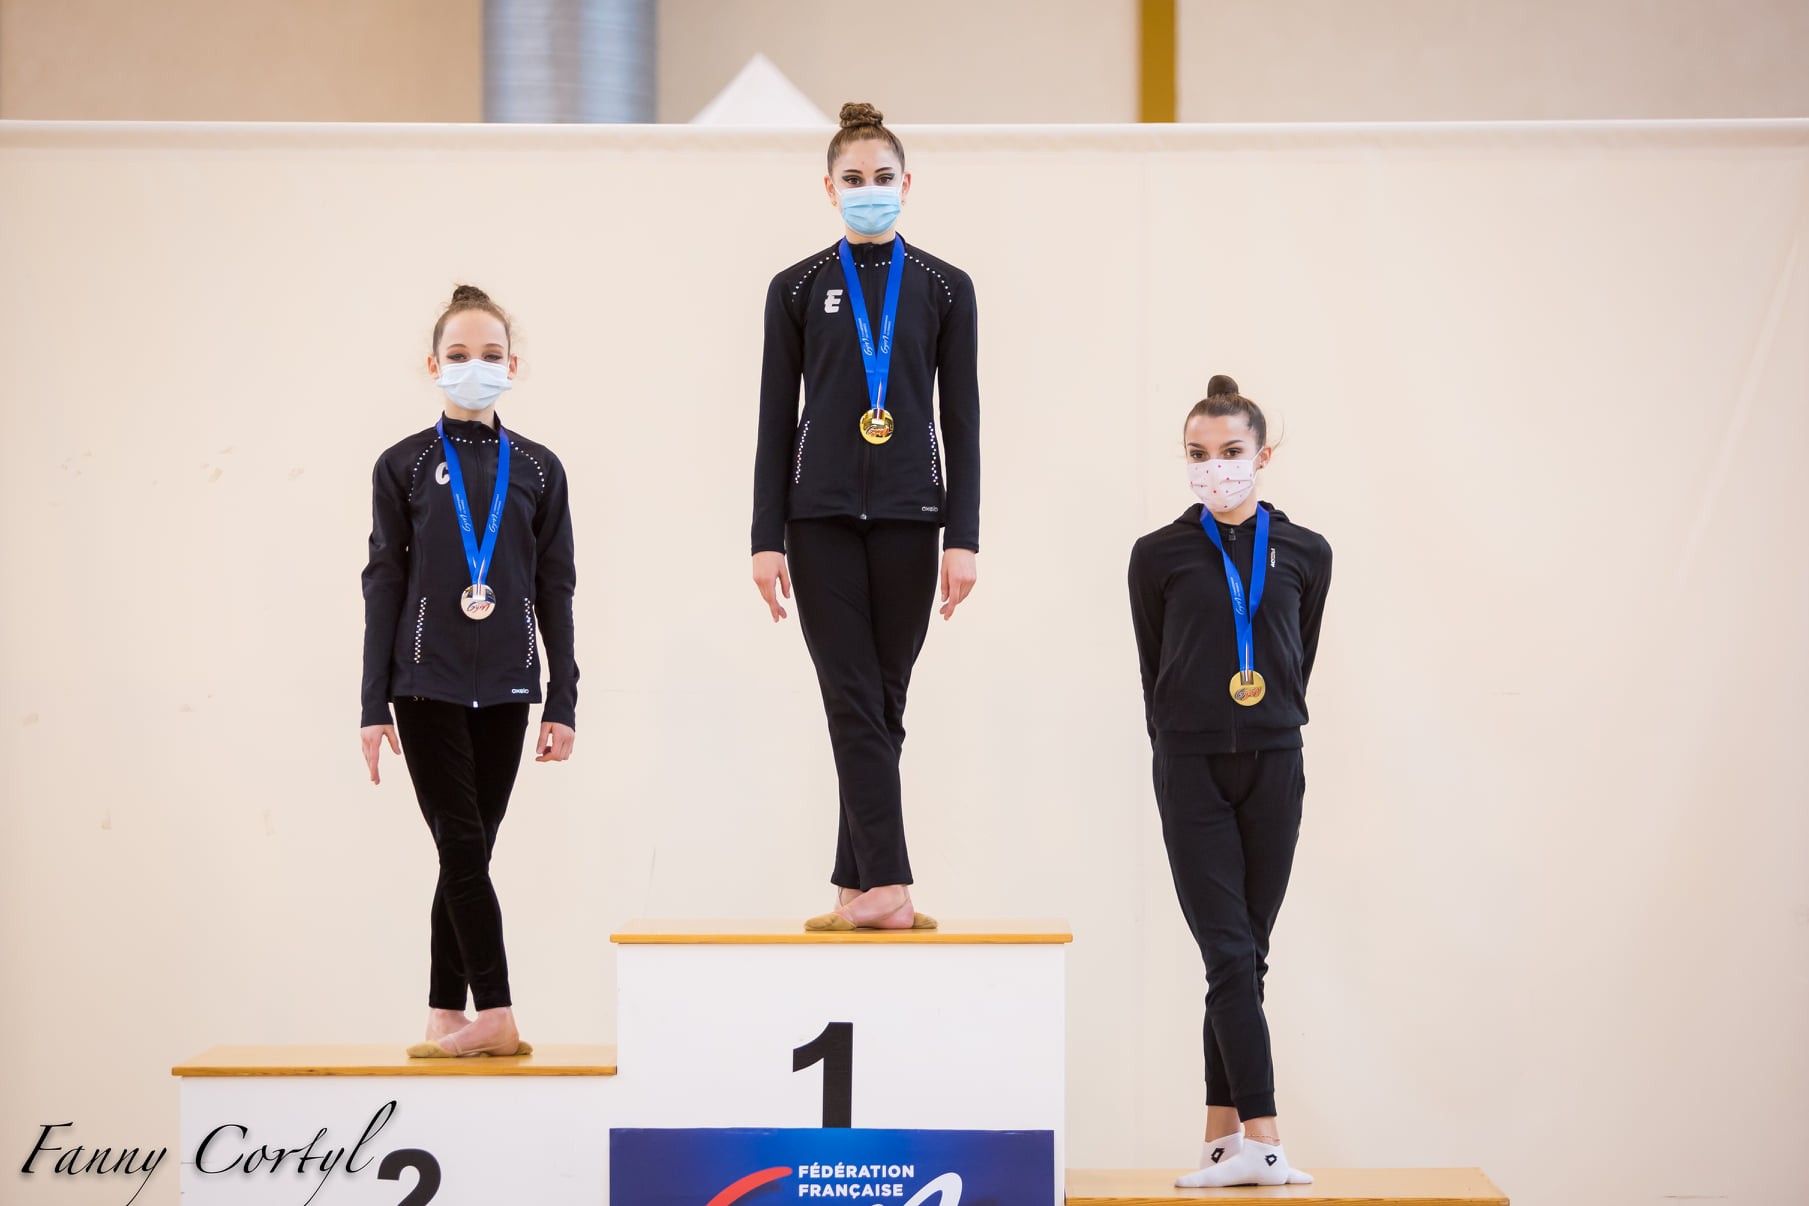 Justine Lavit (Odos) 3eme Junior